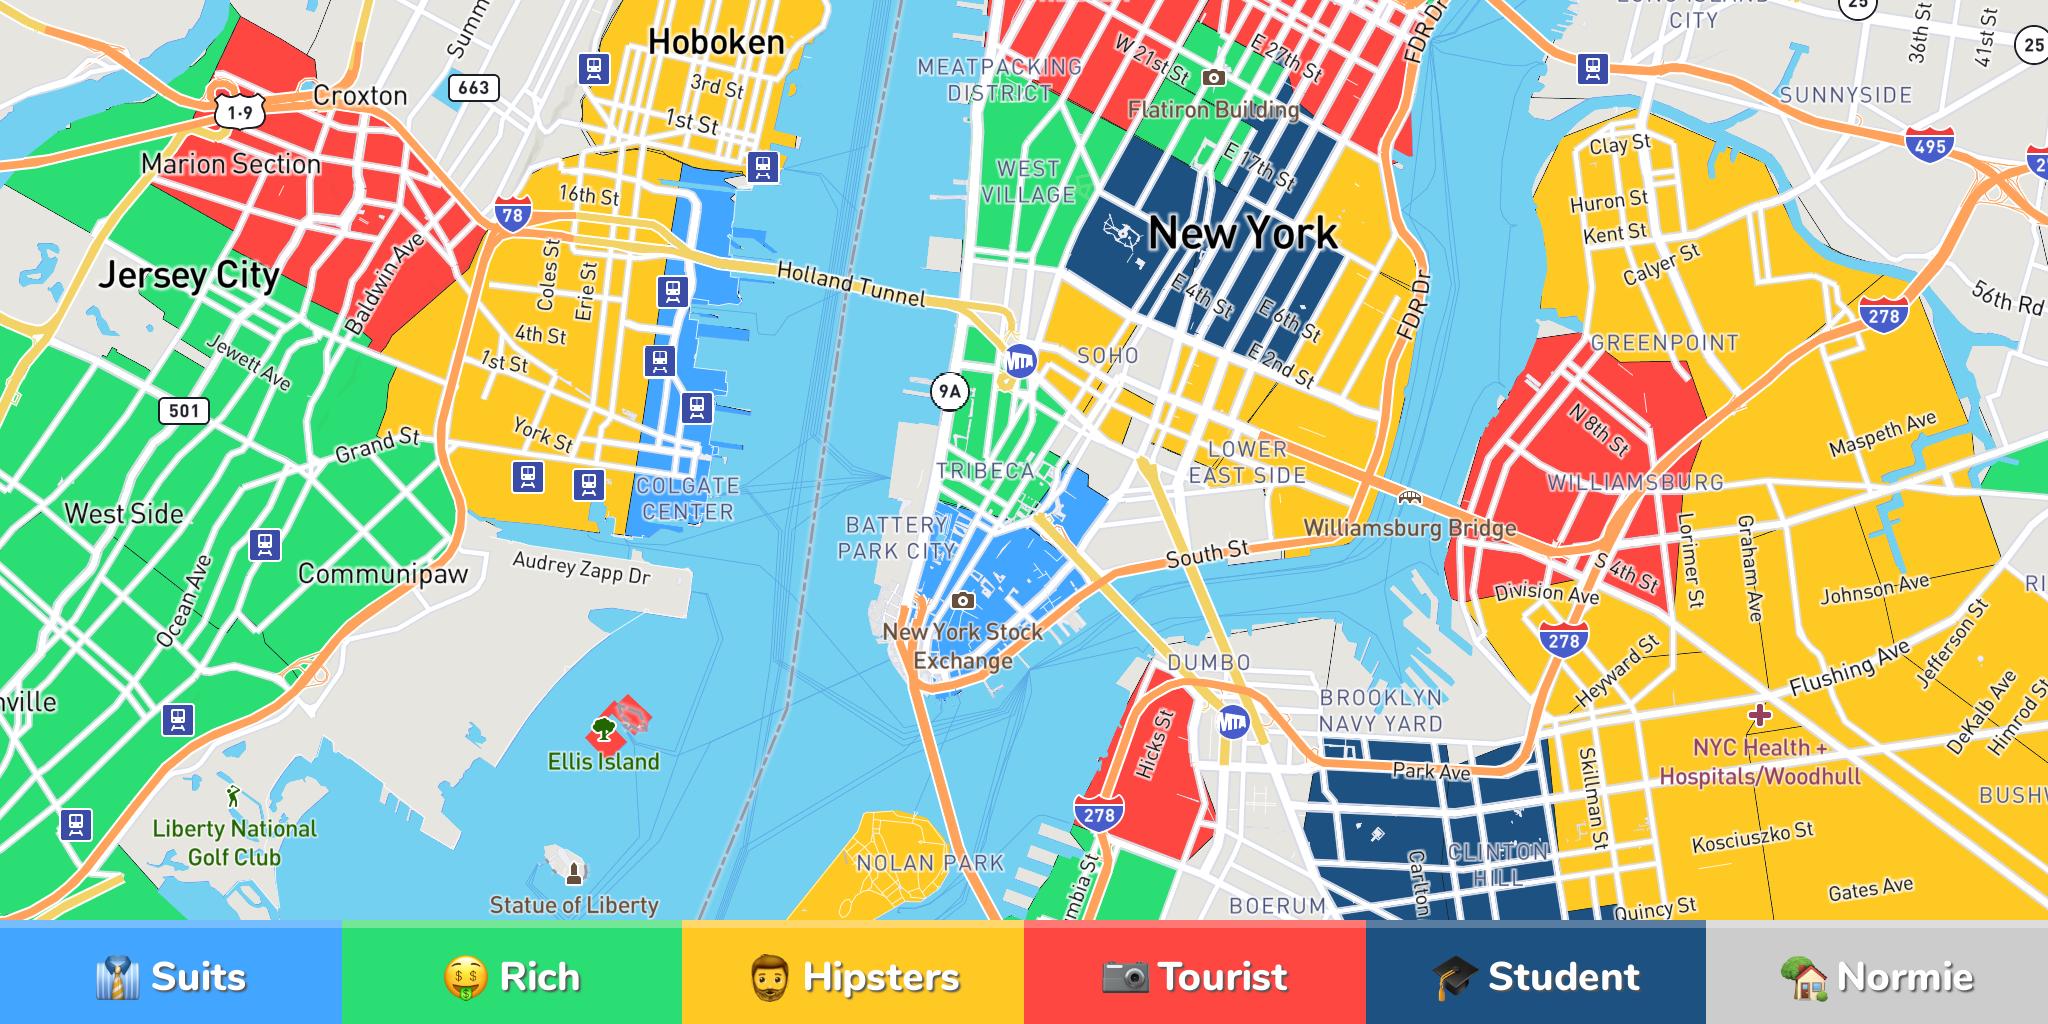 Bad Parts Of La Map. Bad Parts Of Nv, Bad Neighborhood, Bad Parts Of ...